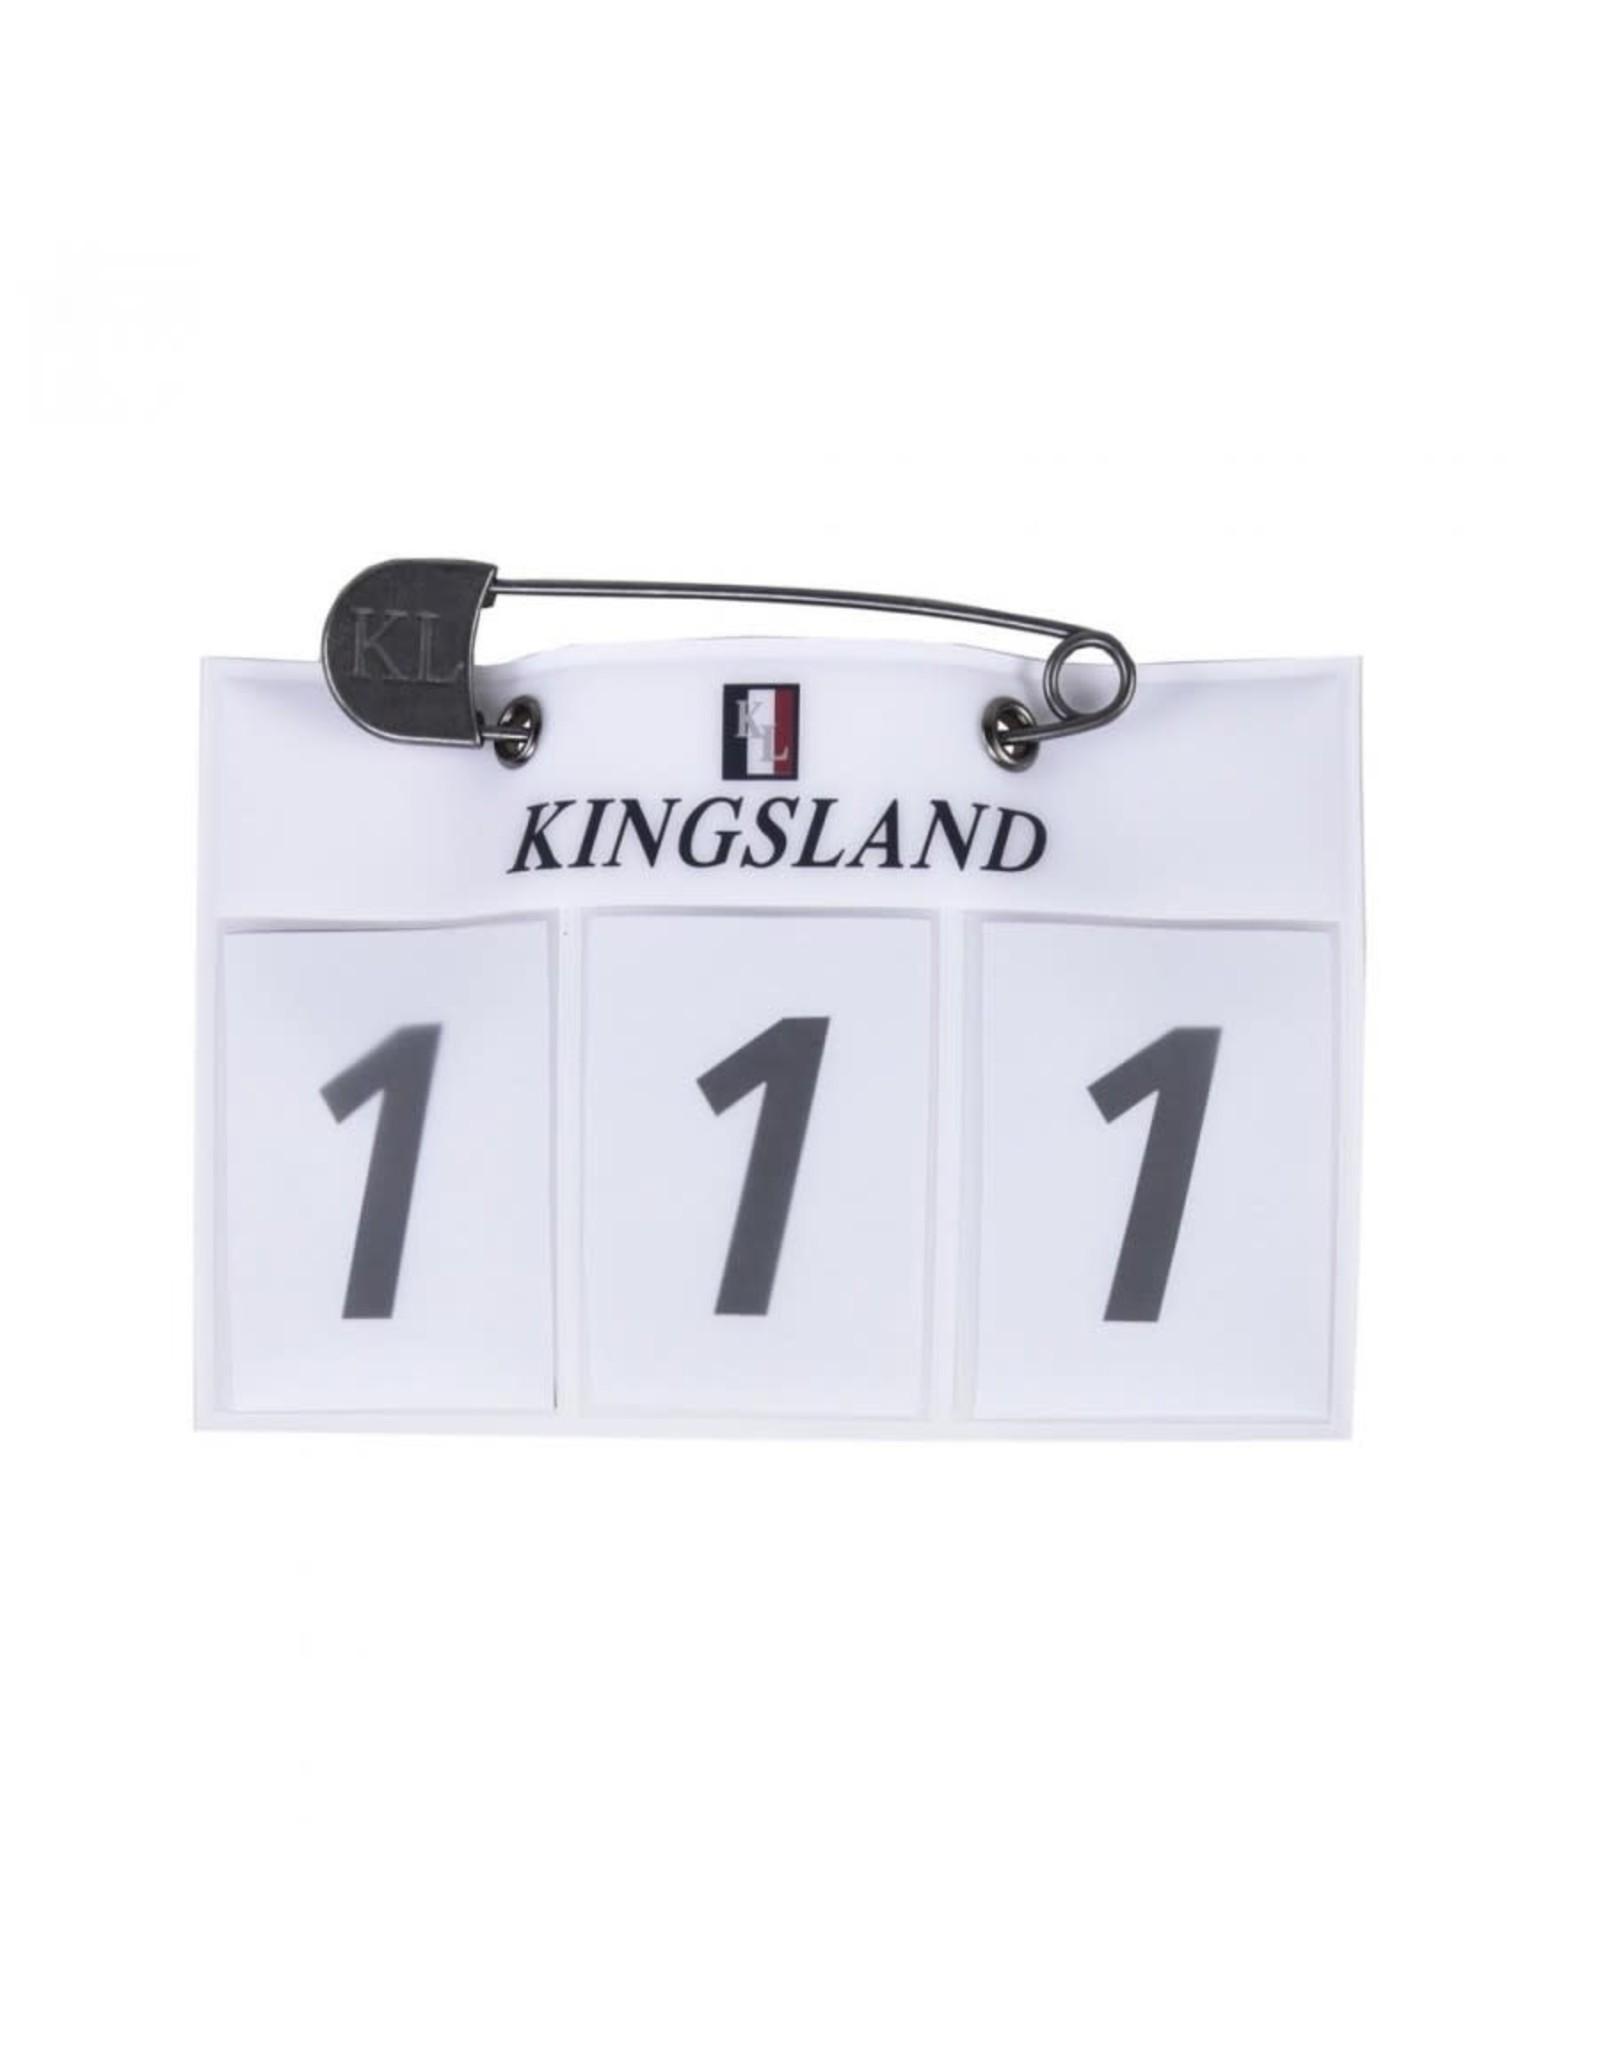 Kingsland KL Classic number plate white